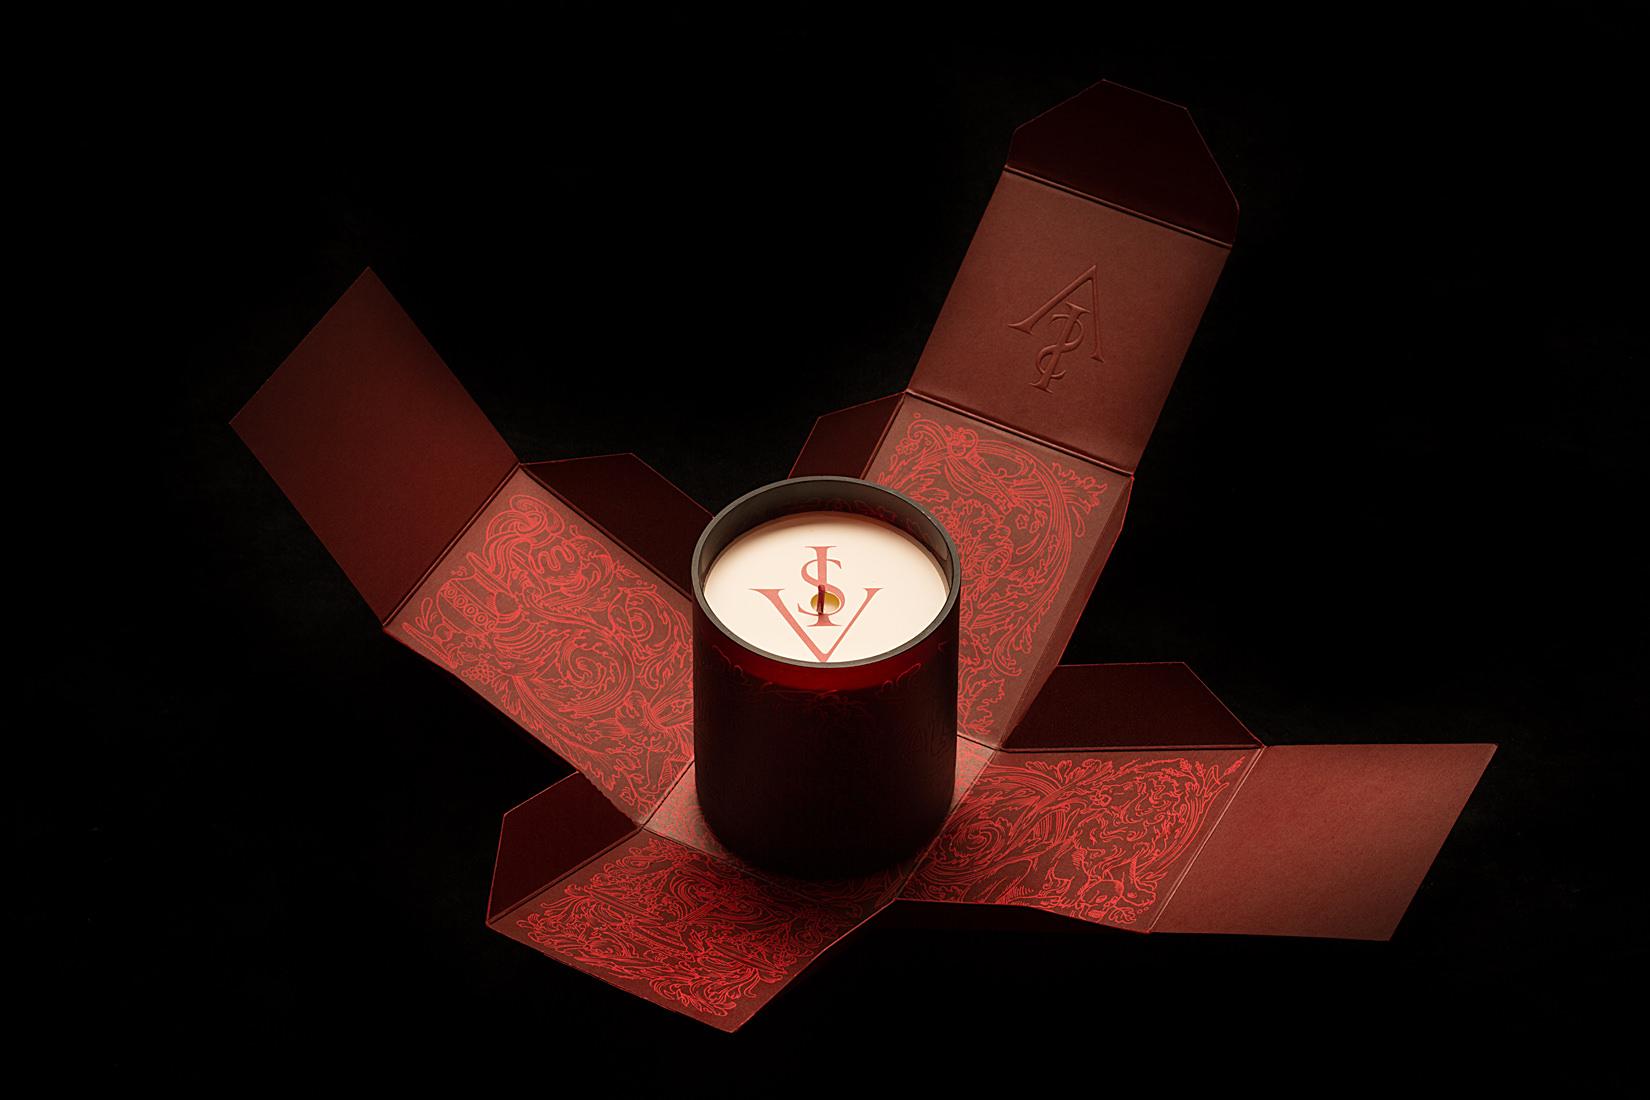 Fortitvdo Candles